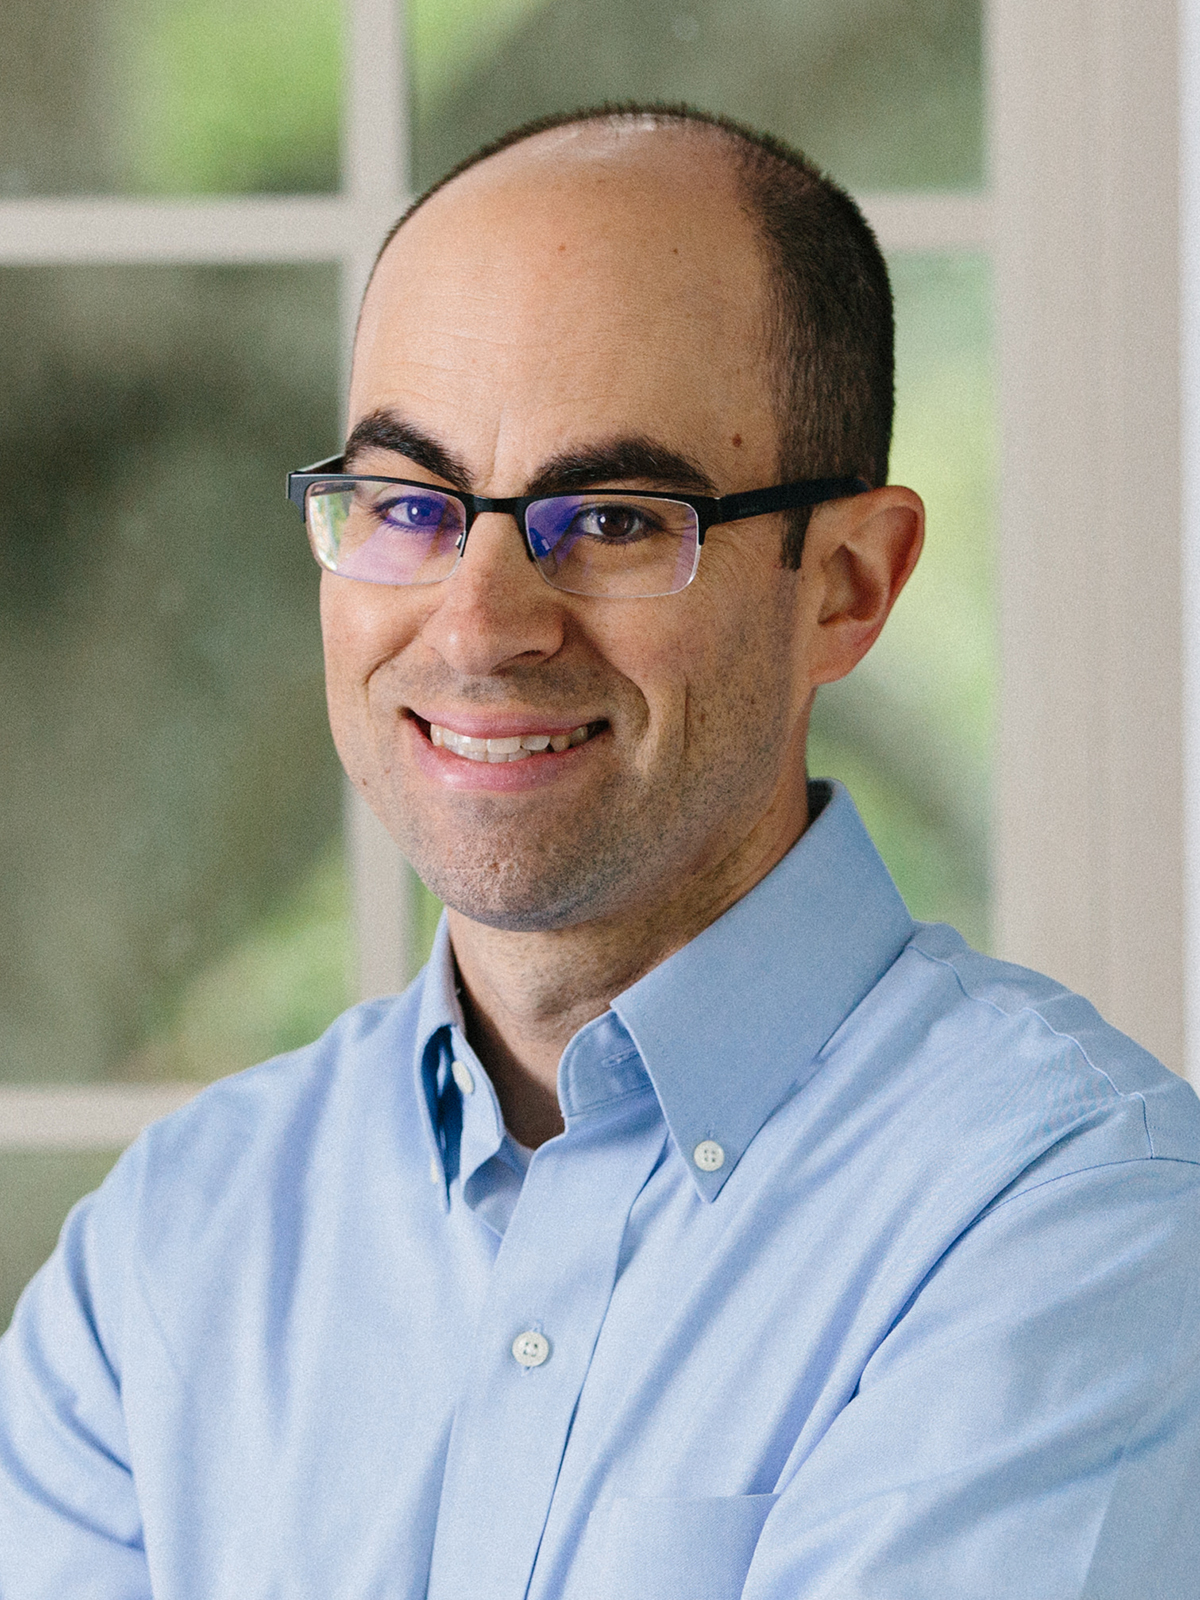 Matt Bernacki portrait image